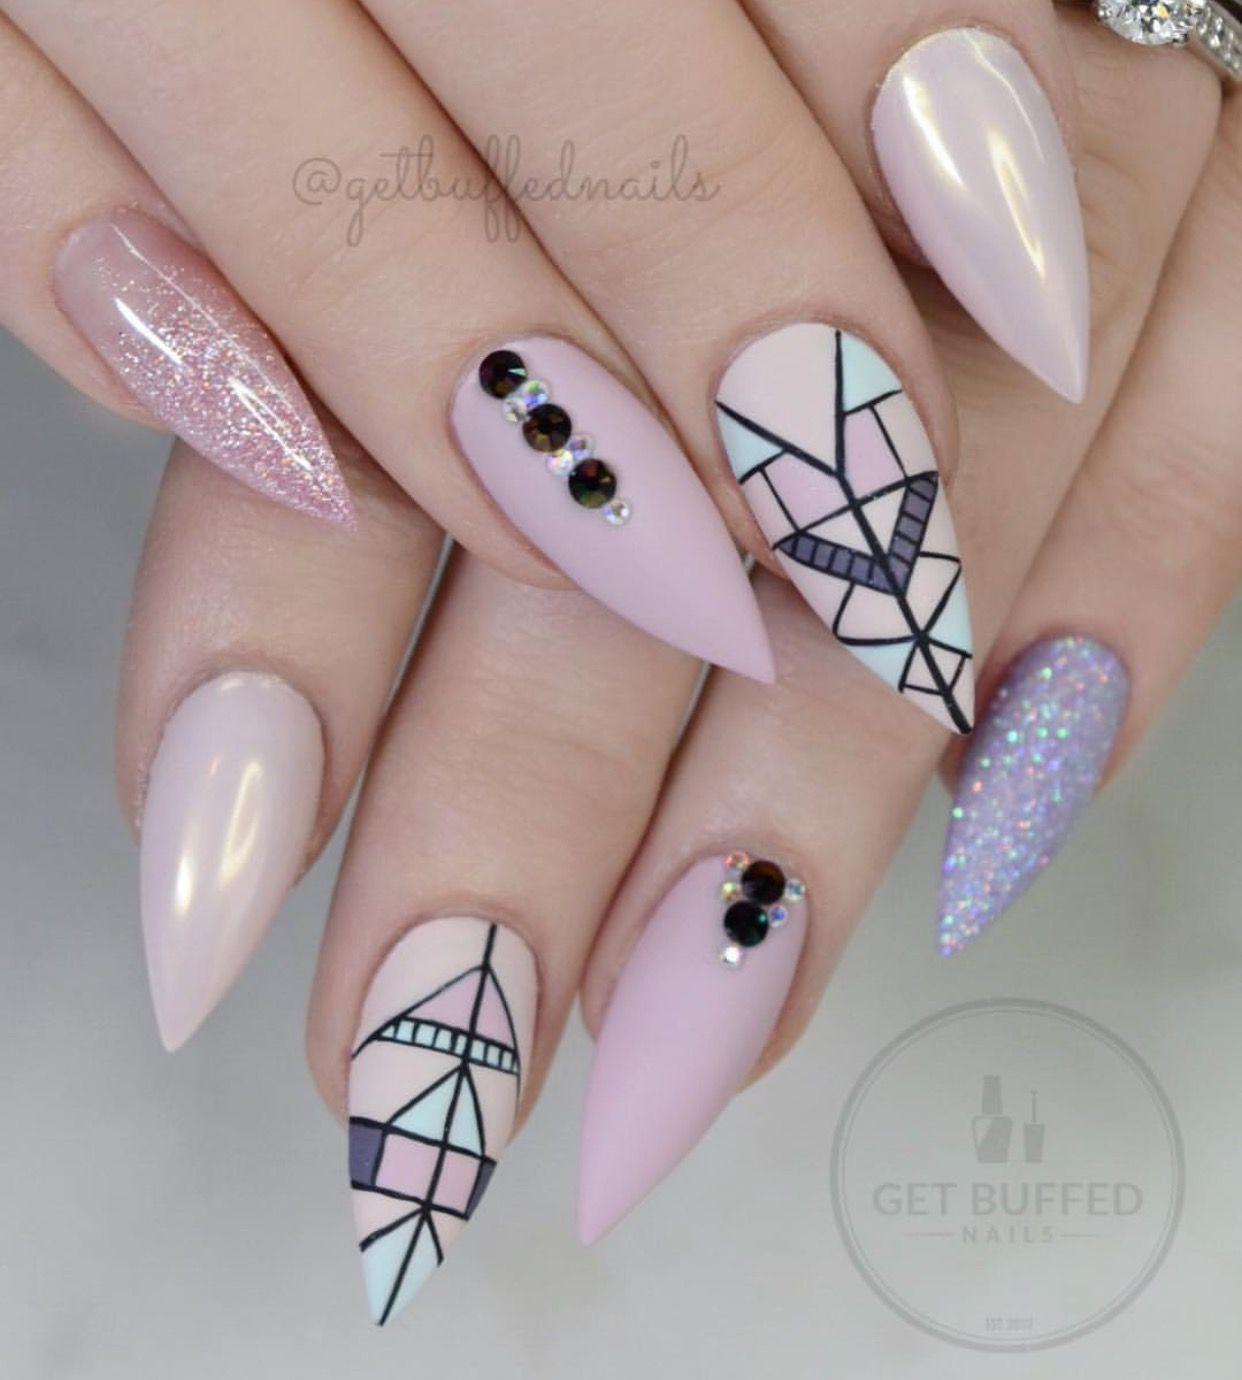 Pin by Μινα Βοσδογαννη on Σχέδια νυχιών | Pinterest | Designer nails ...